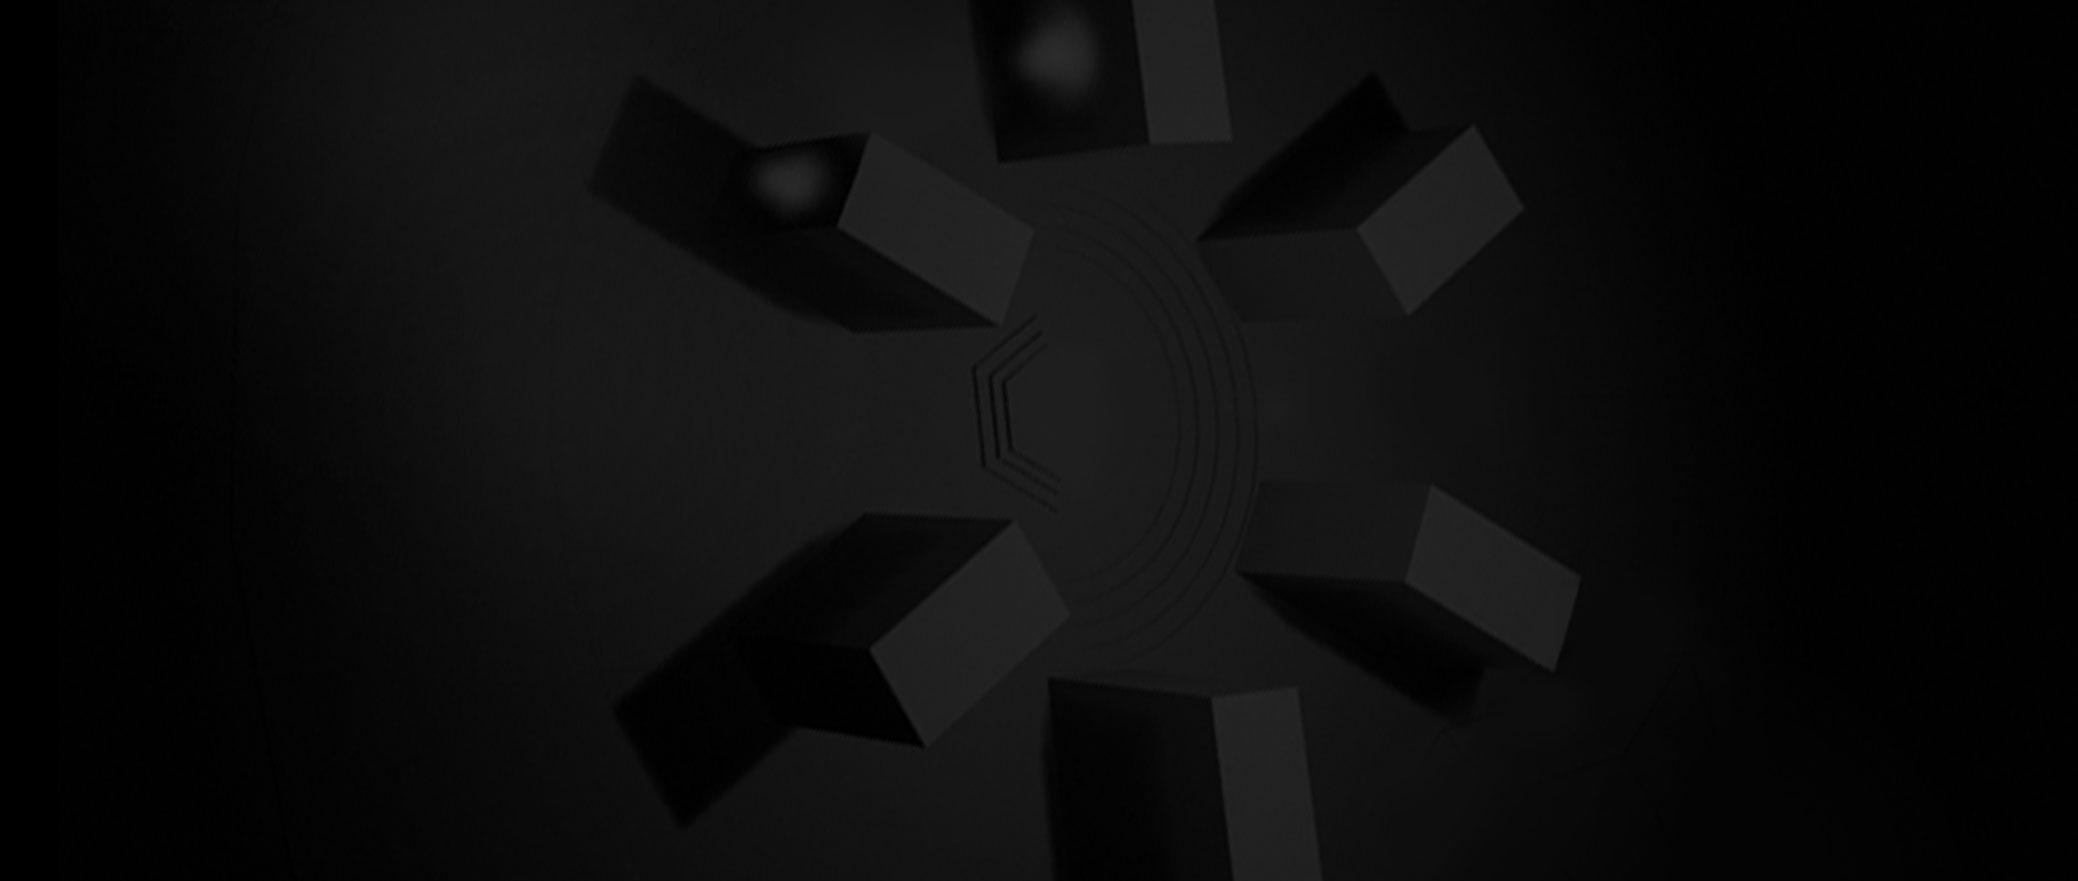 Wraiths_2019Animatic_Thumbsheet-02_103.jpg